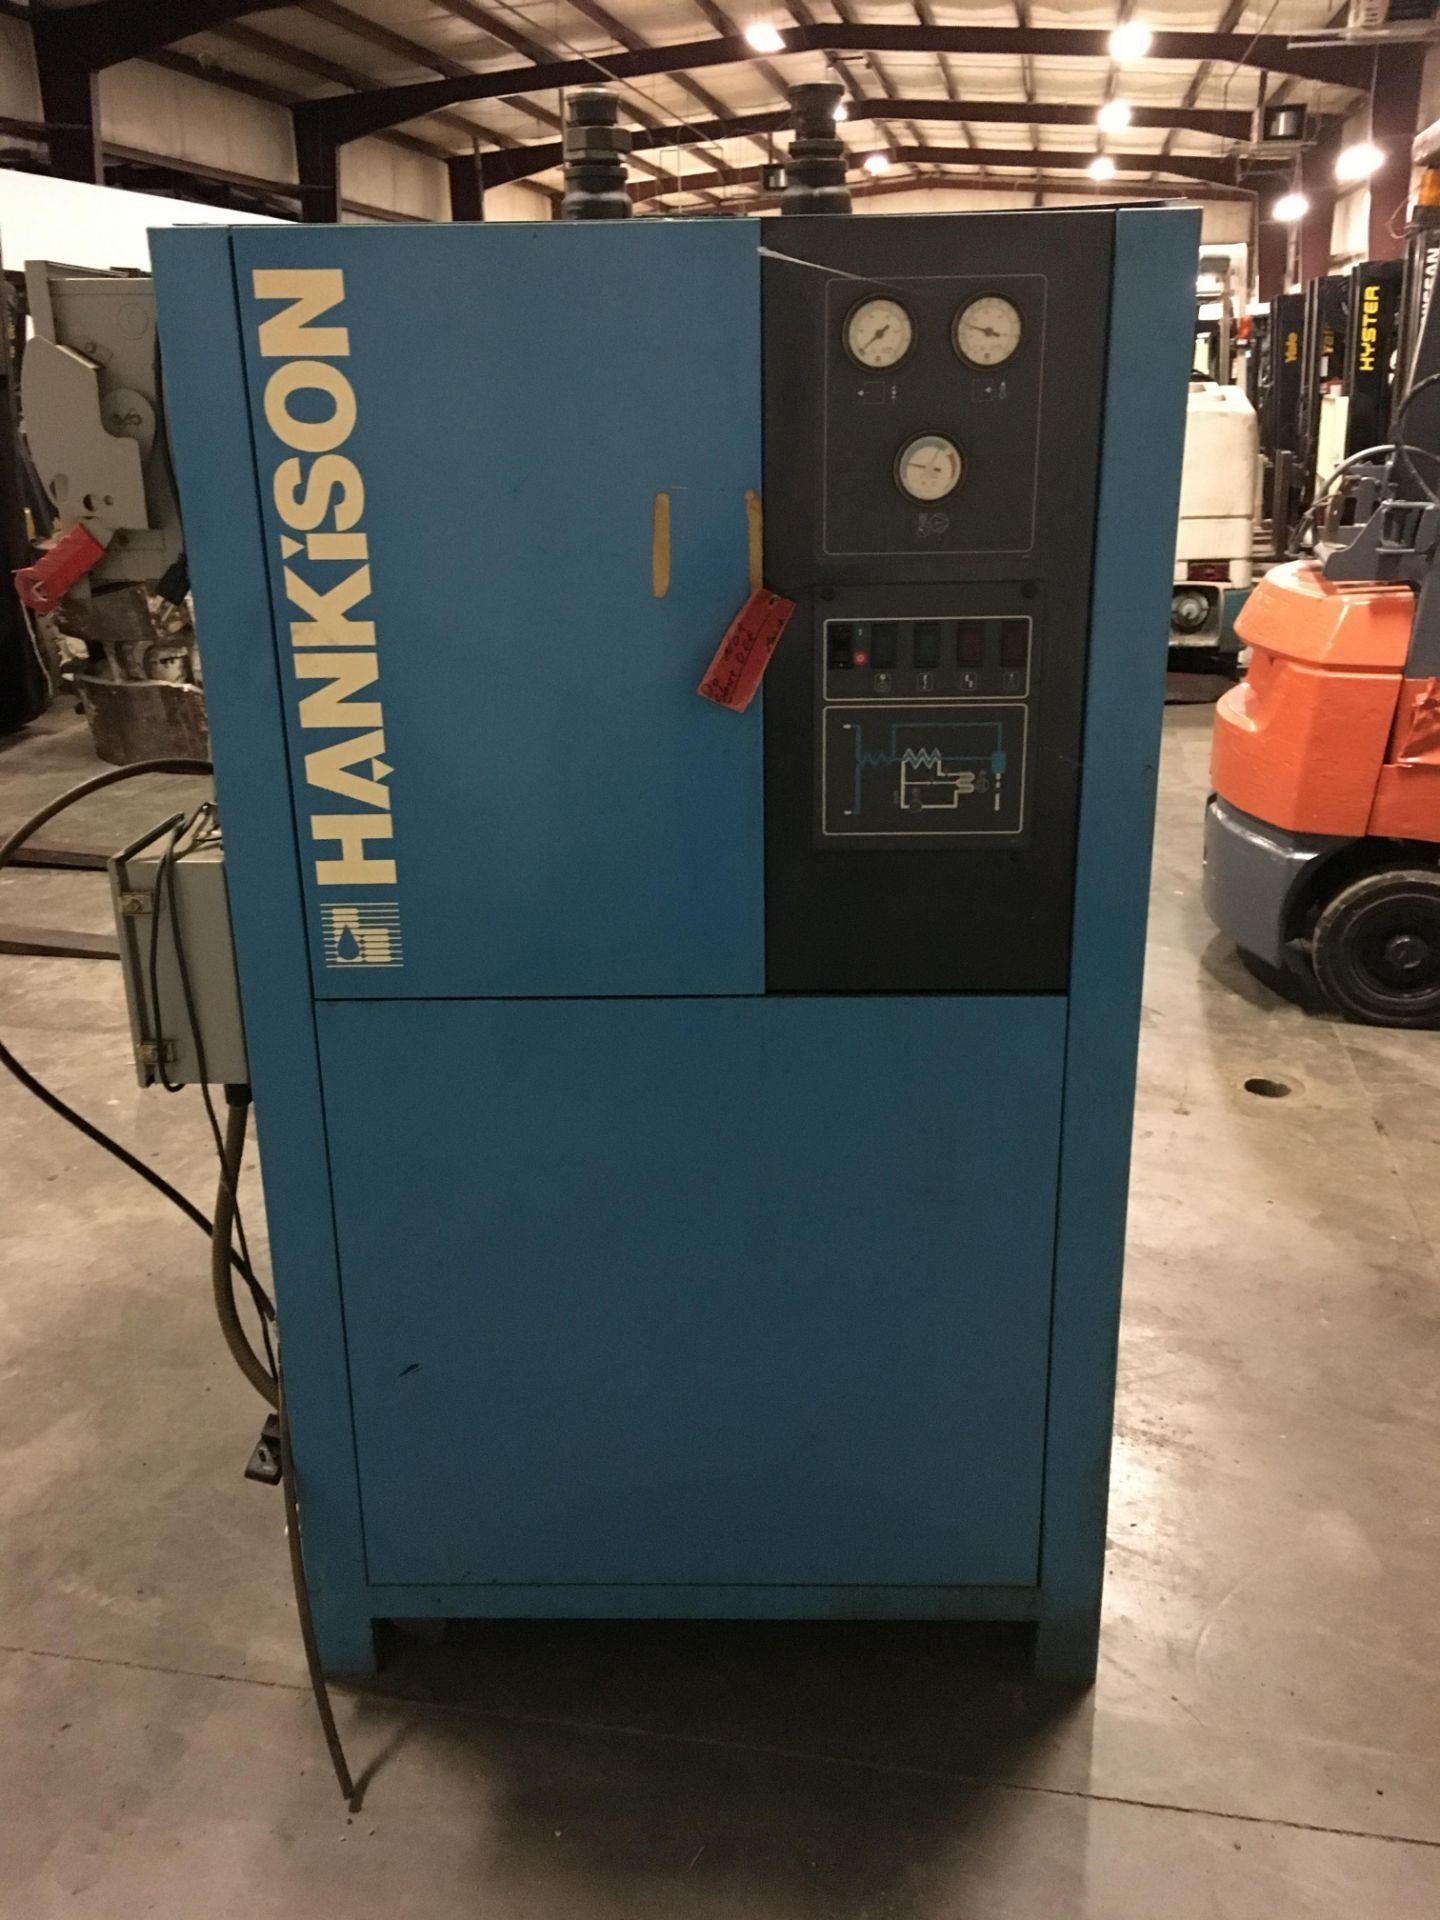 Lot 31 - Hankison International Air Dryer, Model: PR 700–460, S/N: PR 700A– 2–9 902–2 N, 700 SCFM @100 PSIG